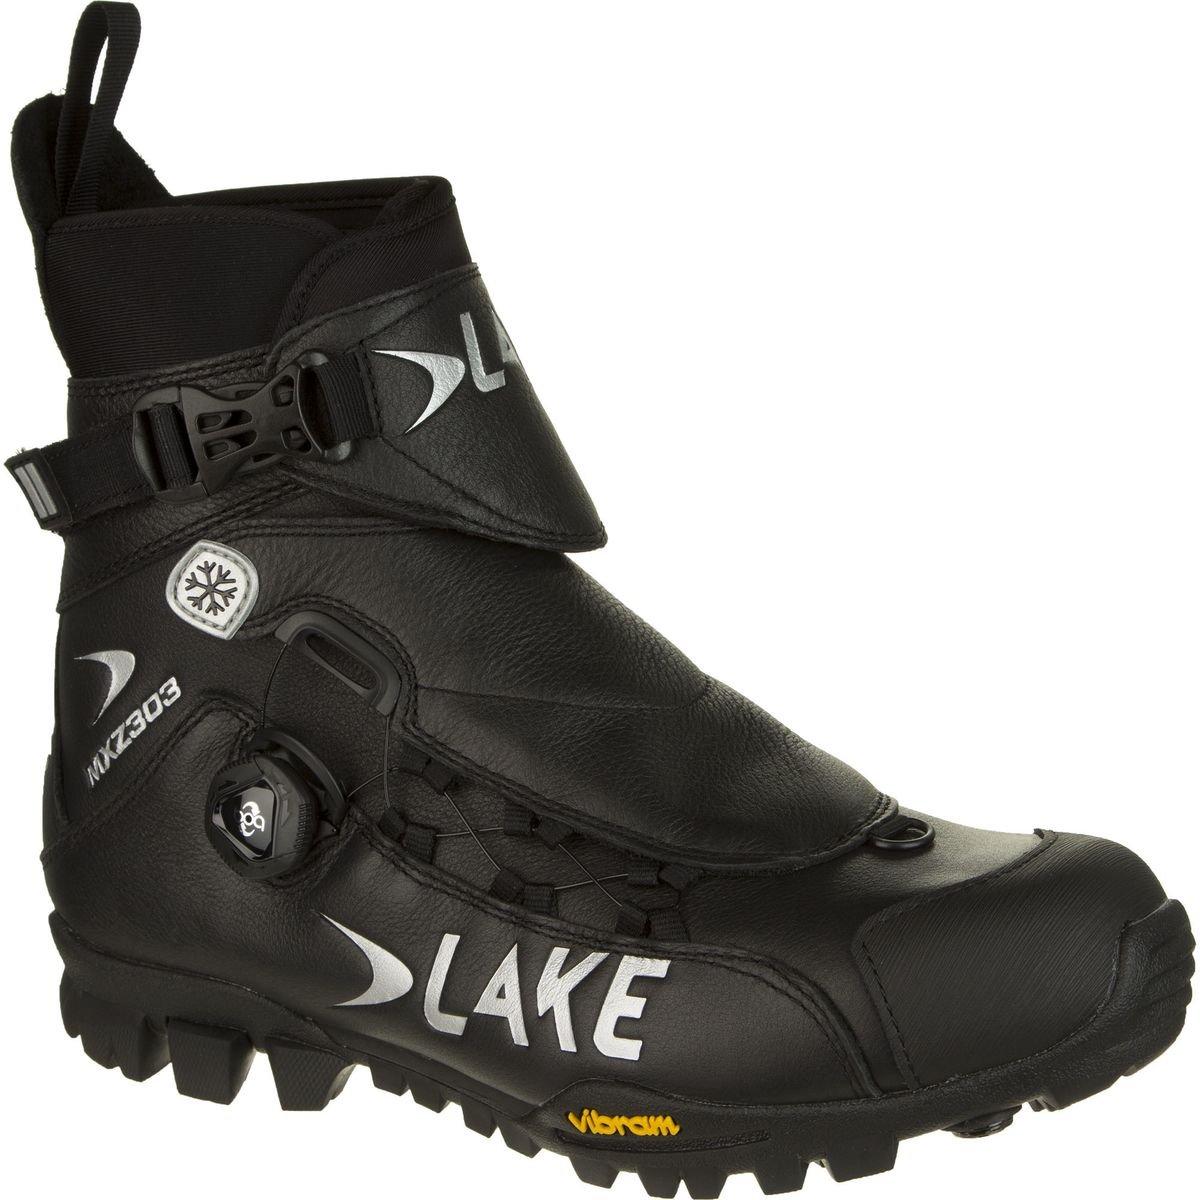 Lake MXZ 303 Winter Boots Black, 41.0 - Men's